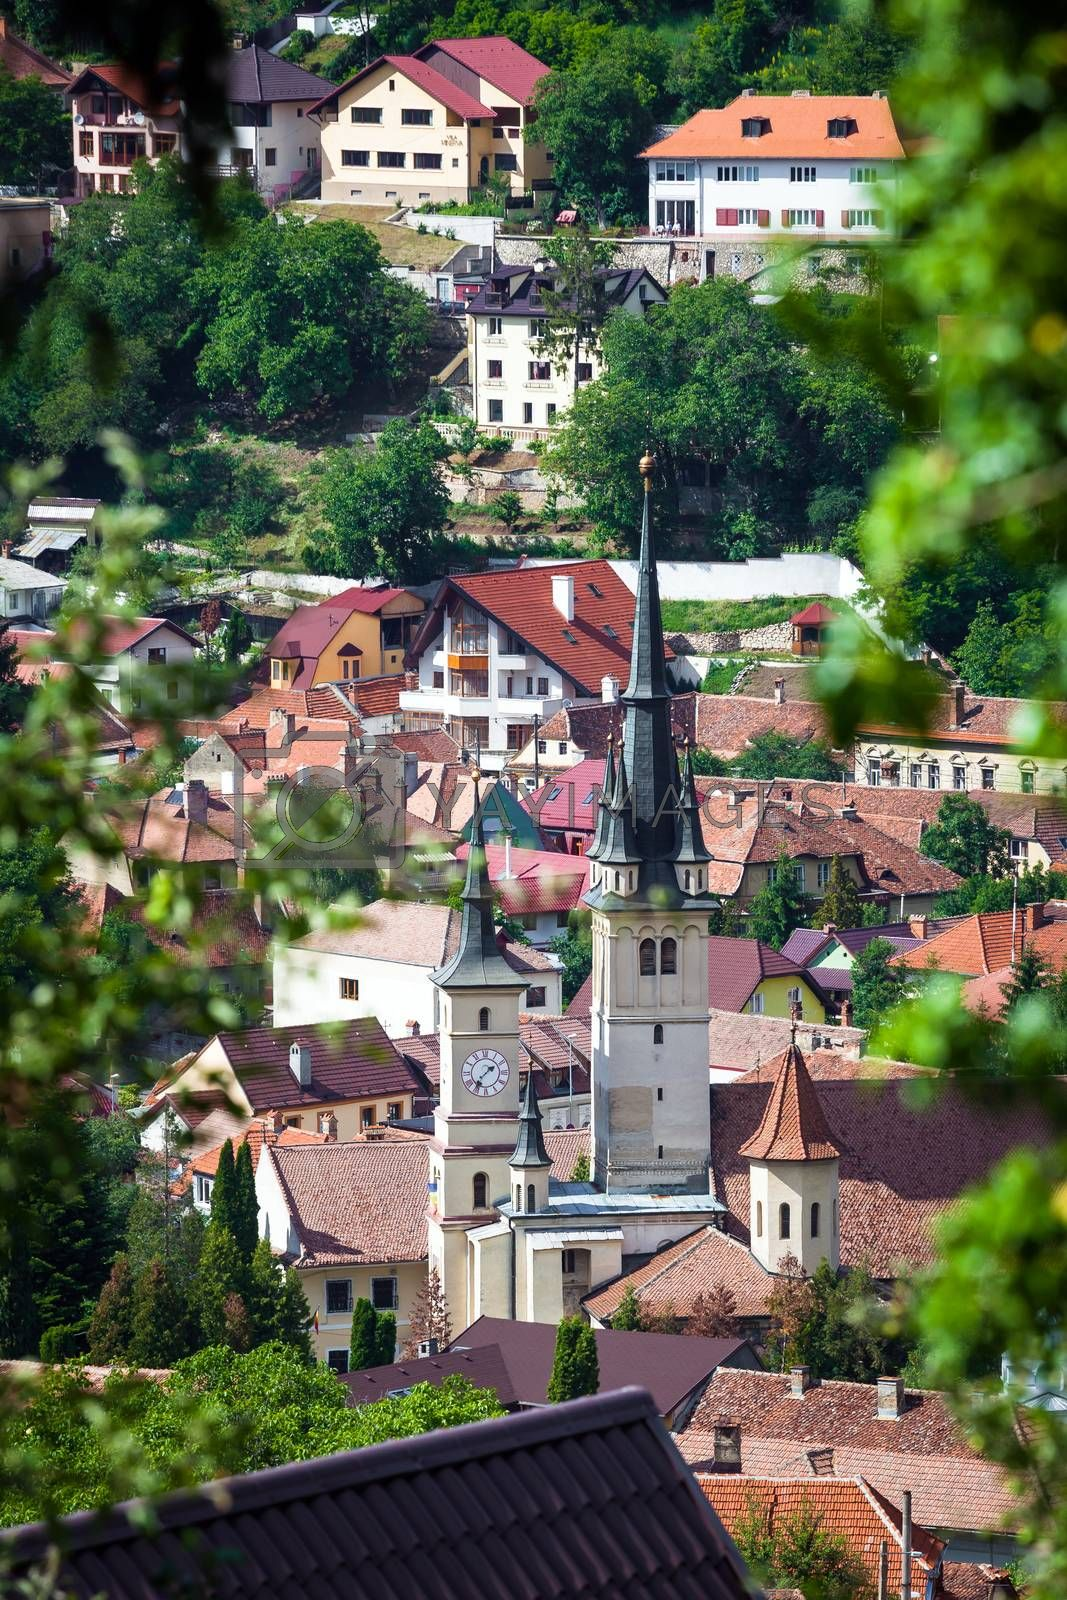 St. Nicholas Church bell tower, Brasov by PixAchi